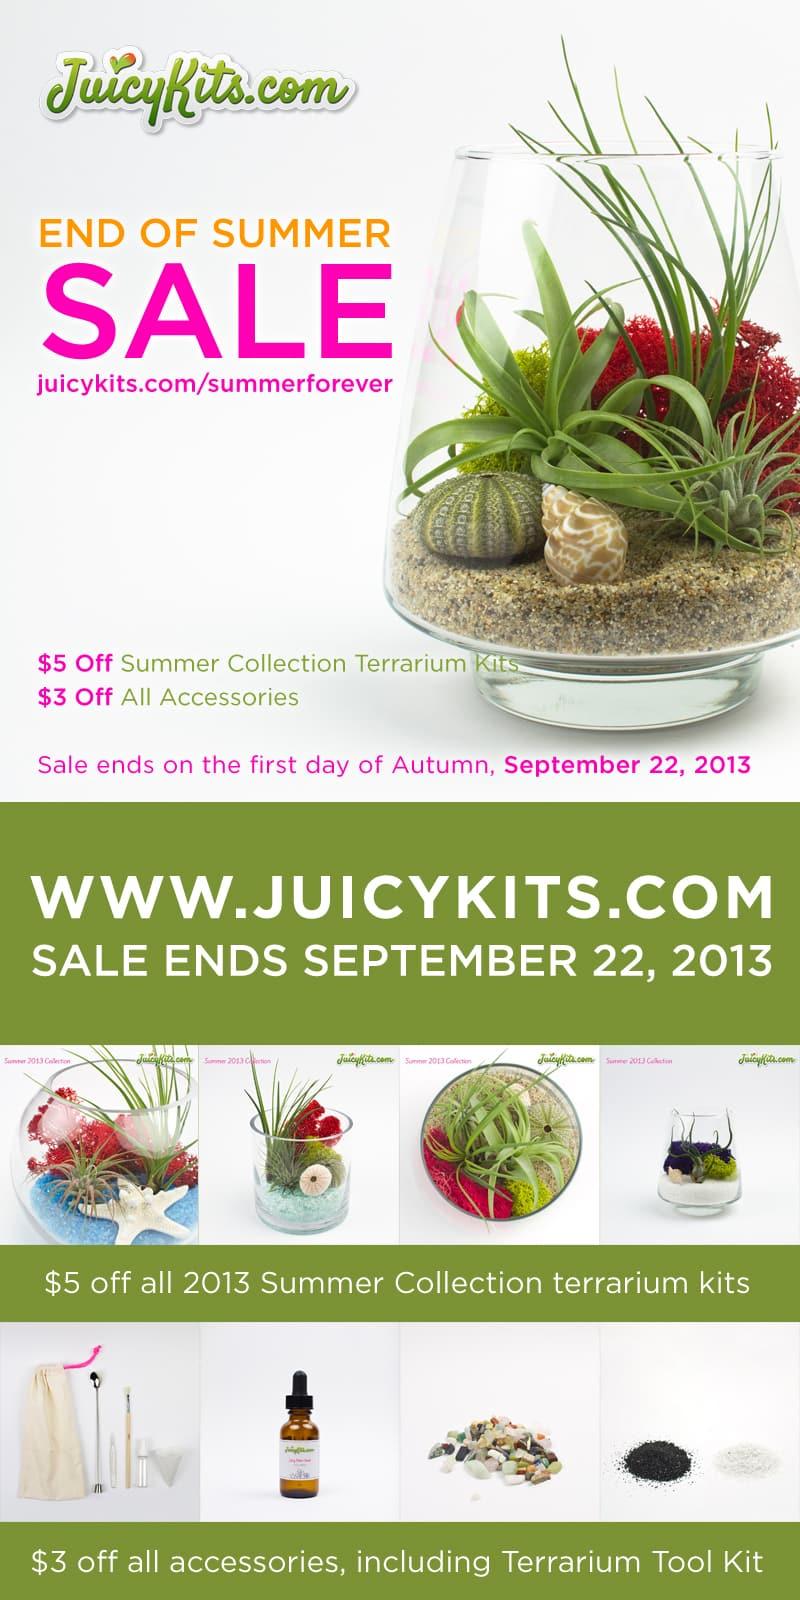 juicykits.com-end-of-summer-sale-tall